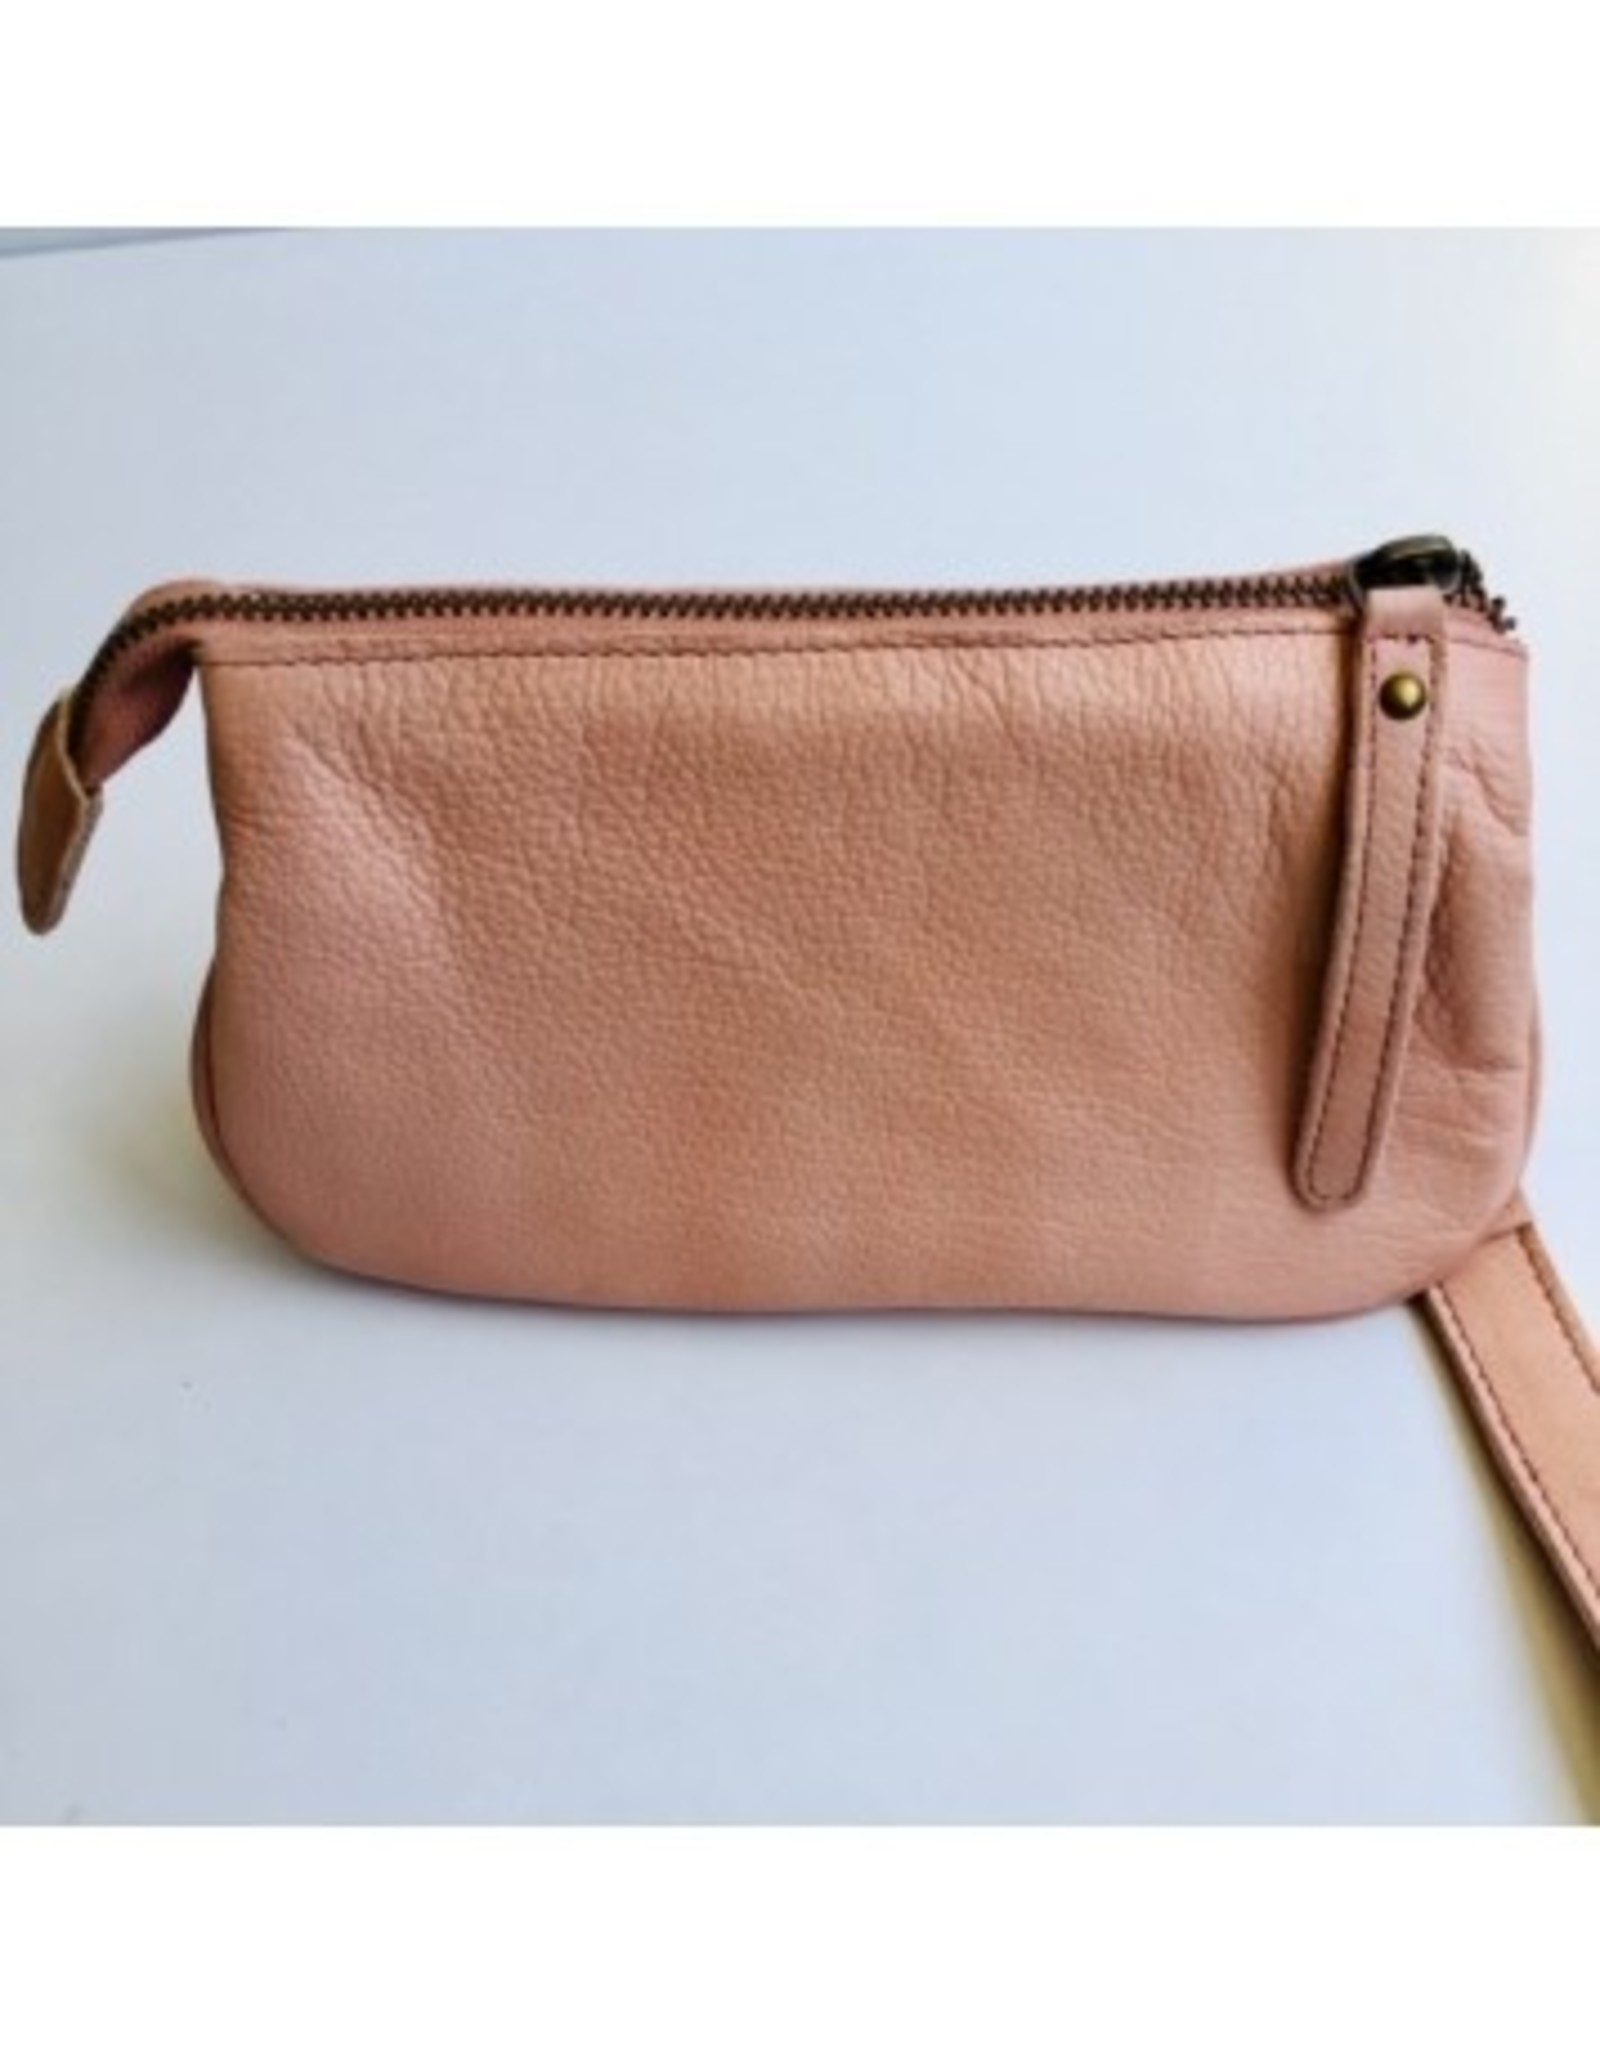 St Kilda - Clutch / Wallet - Blush